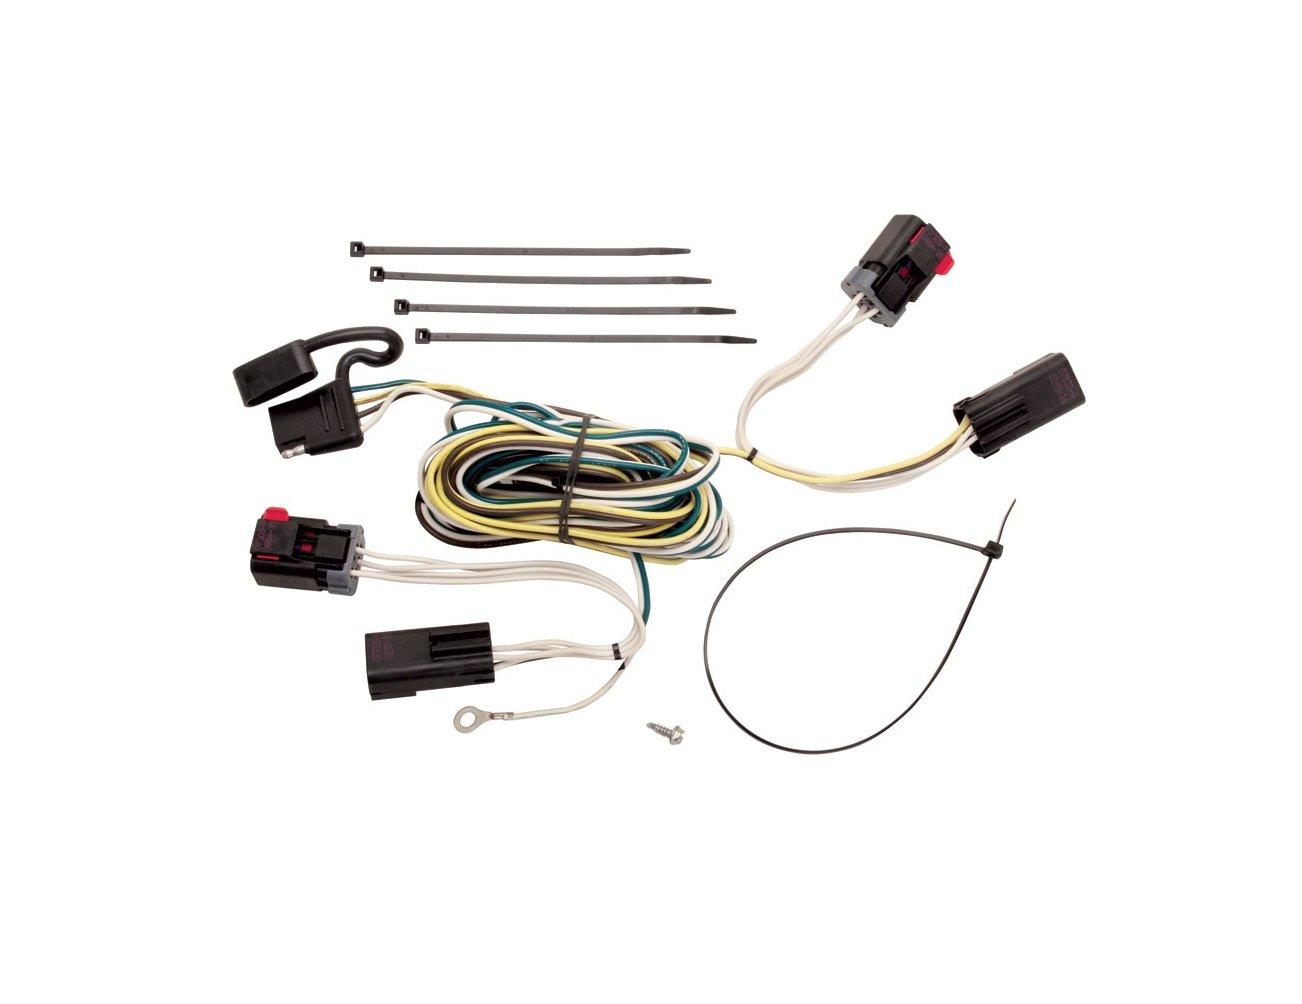 amazoncom tekonsha 118300 t one connector assembly automotive